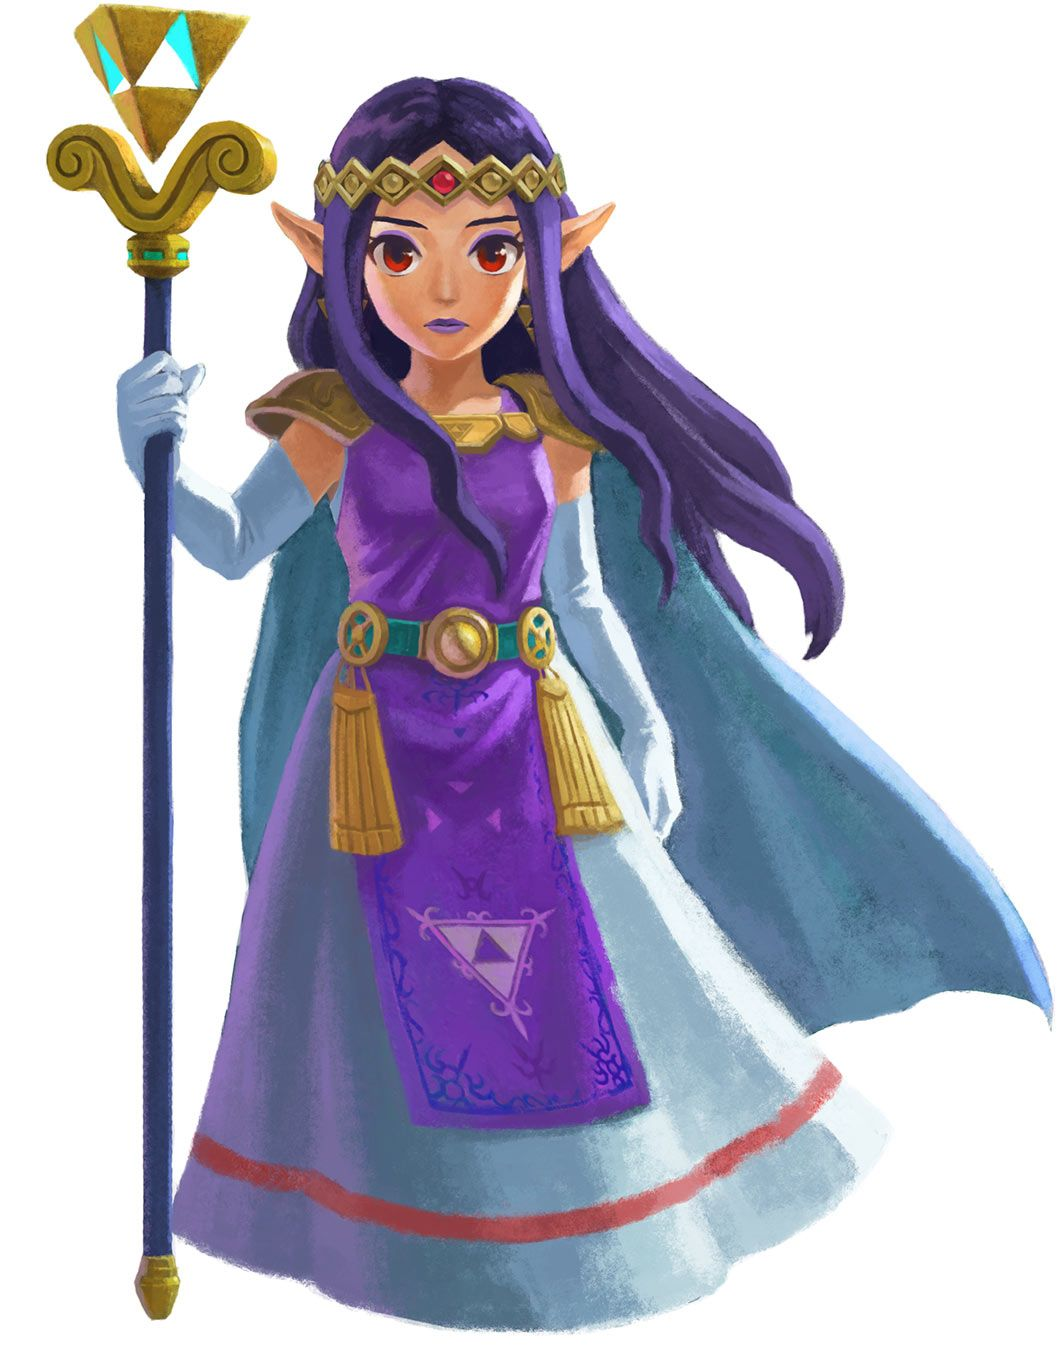 Princess Hilda Characters Art The Legend Of Zelda A Link